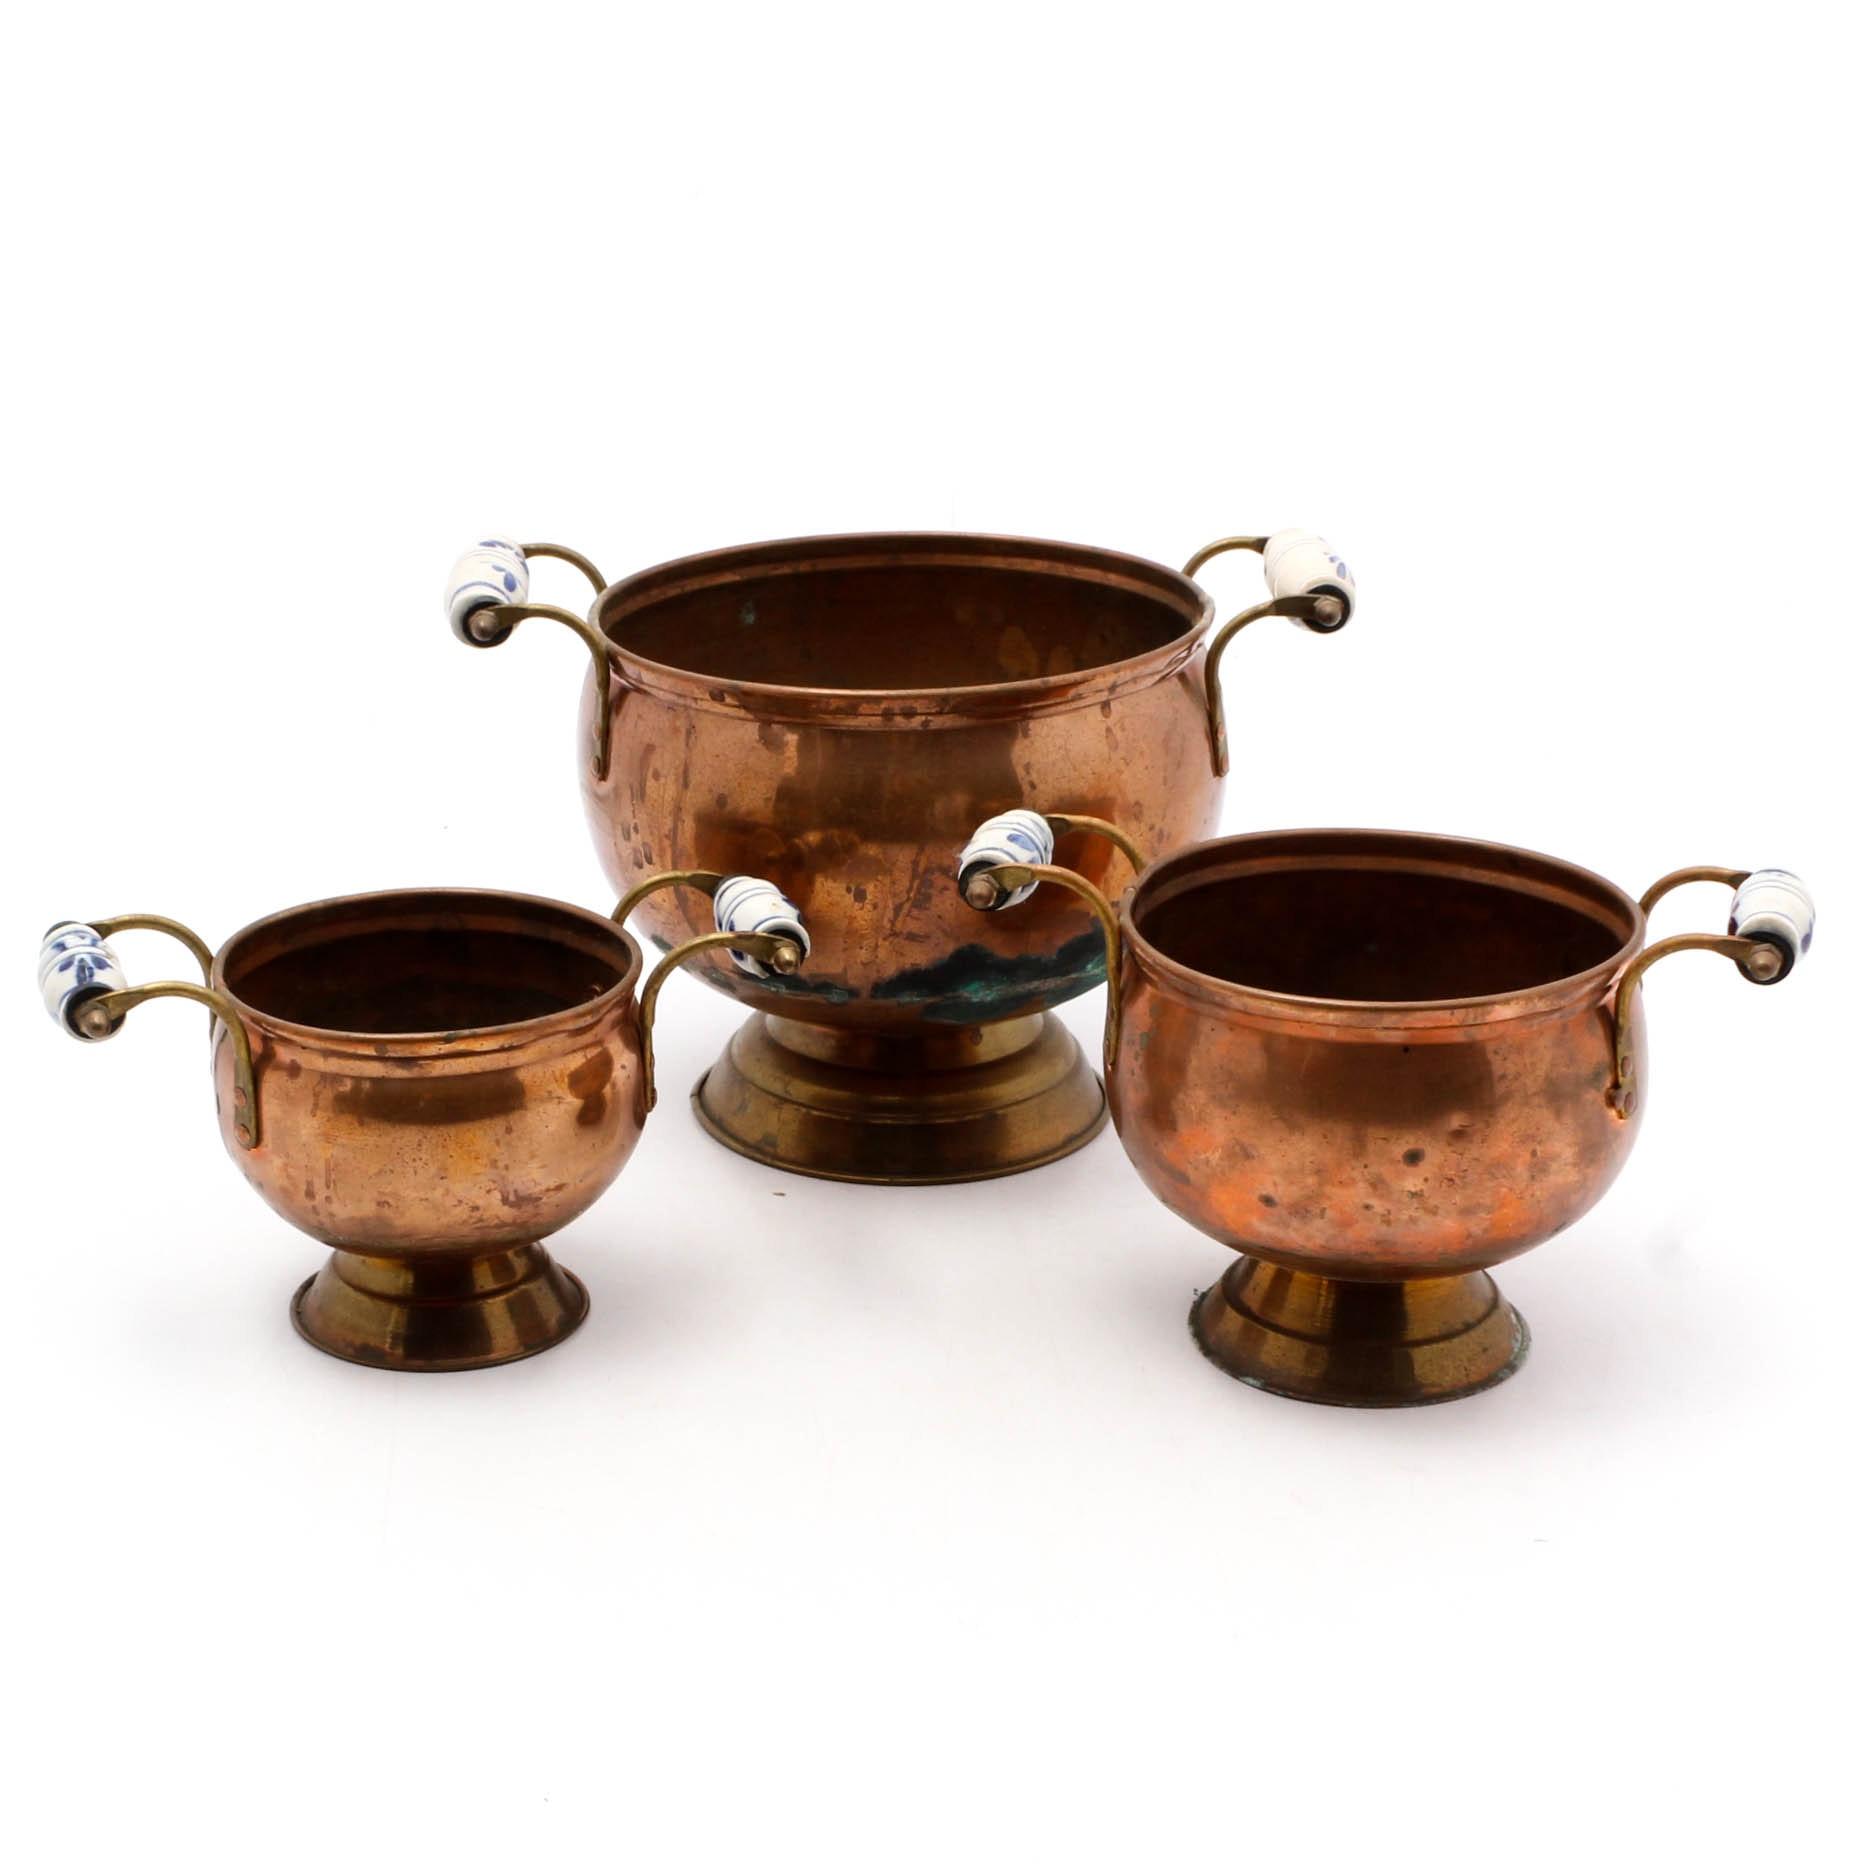 Antique Dutch Copper Footed Bowls with Porcelain Handles